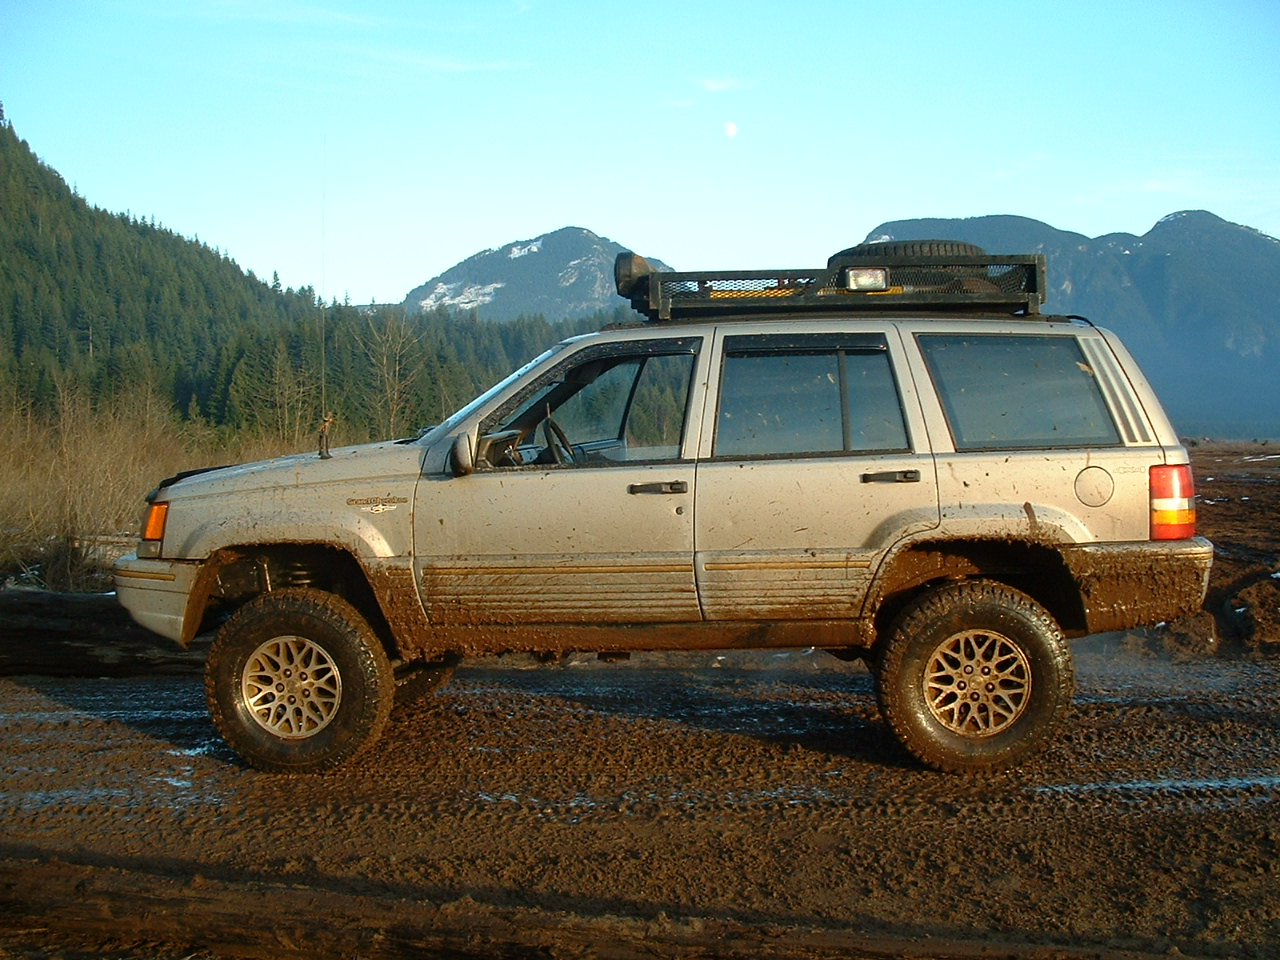 blakes_jeep_027.jpg